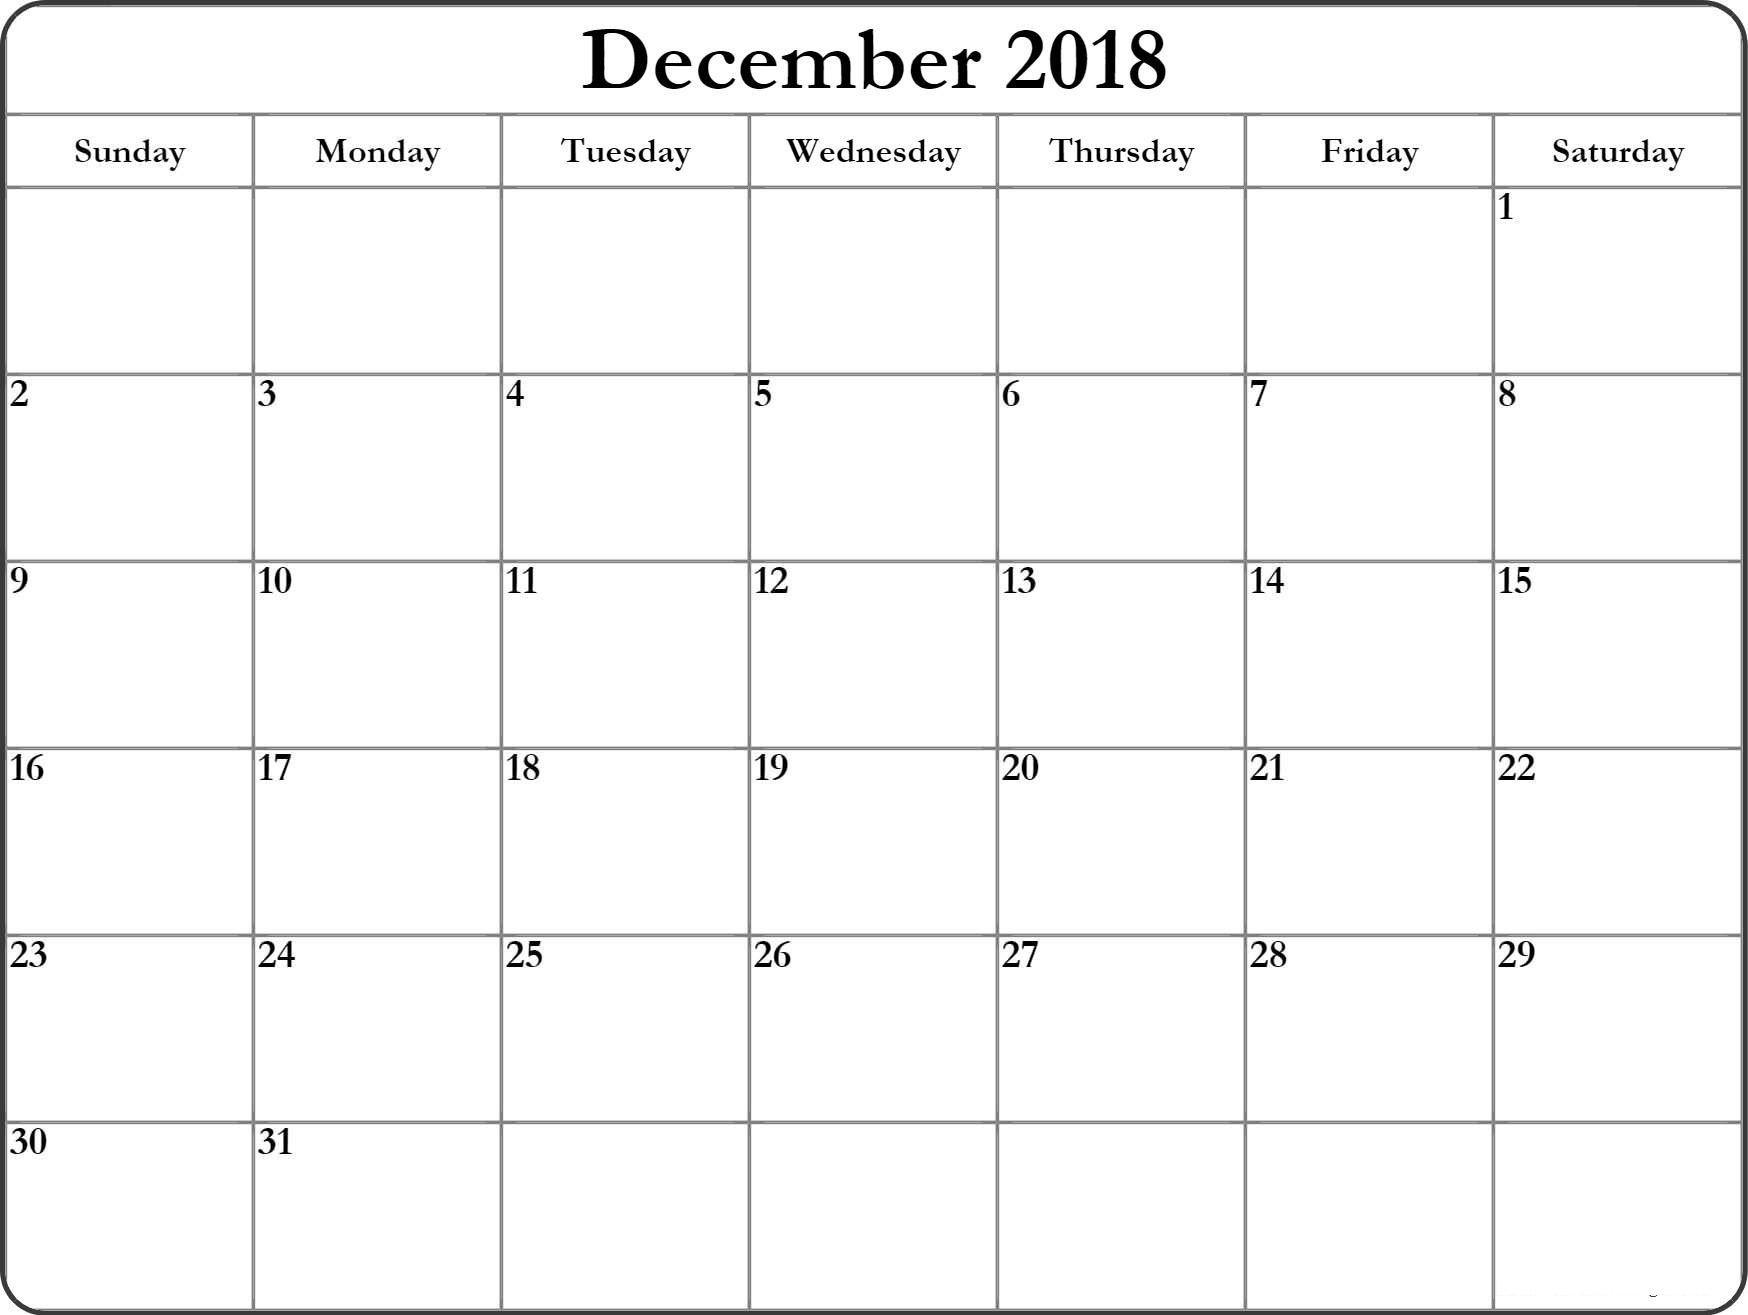 December 2018 Monthly Calendar Excel With Notes MonthlyCalendar MonthlyPrintableTemplate MonthlyDecemberCalendar 2018Calendar